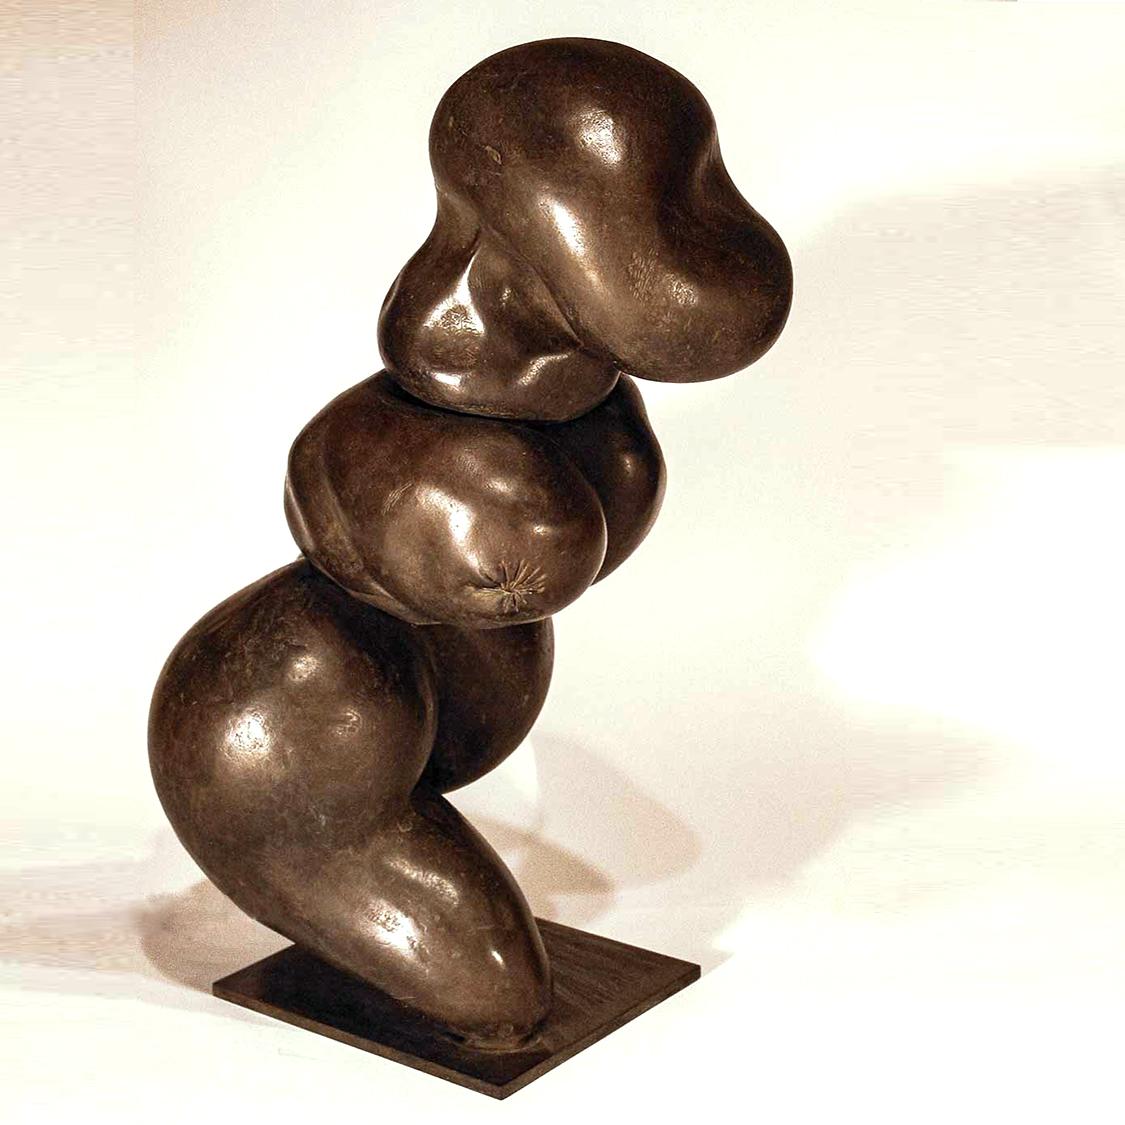 equilibre-turzo-sculpture-6.jpg